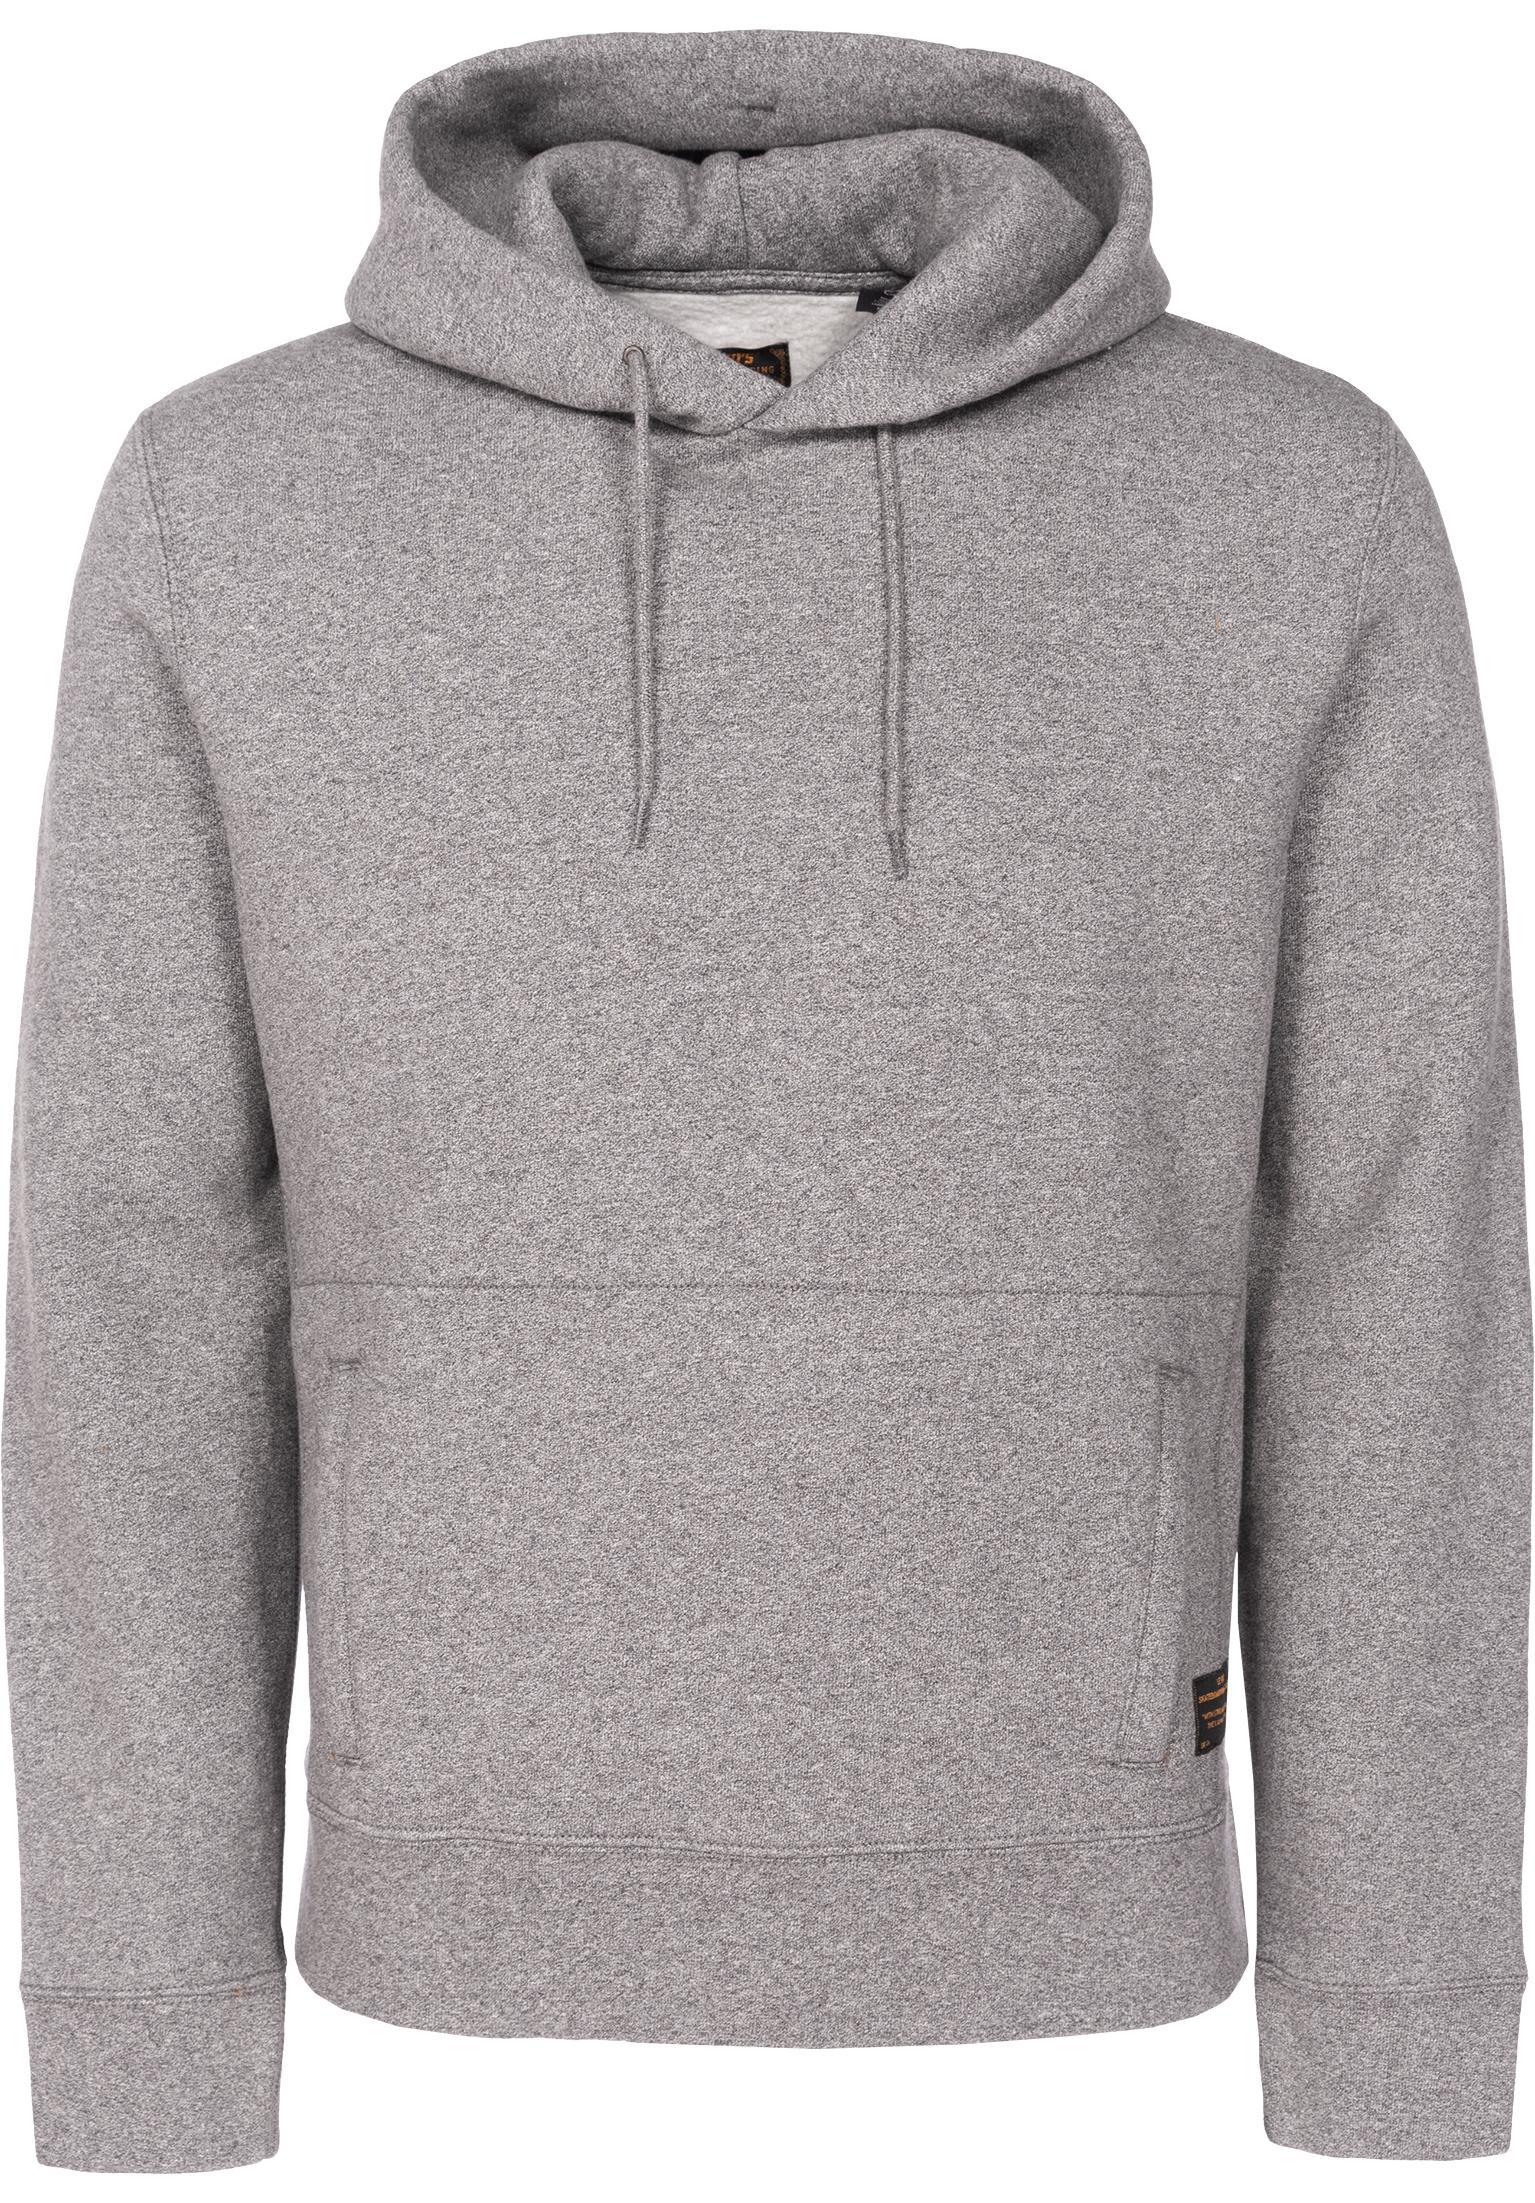 Pullover & Hoodies Damen | Skate Hoodies | Vans DE